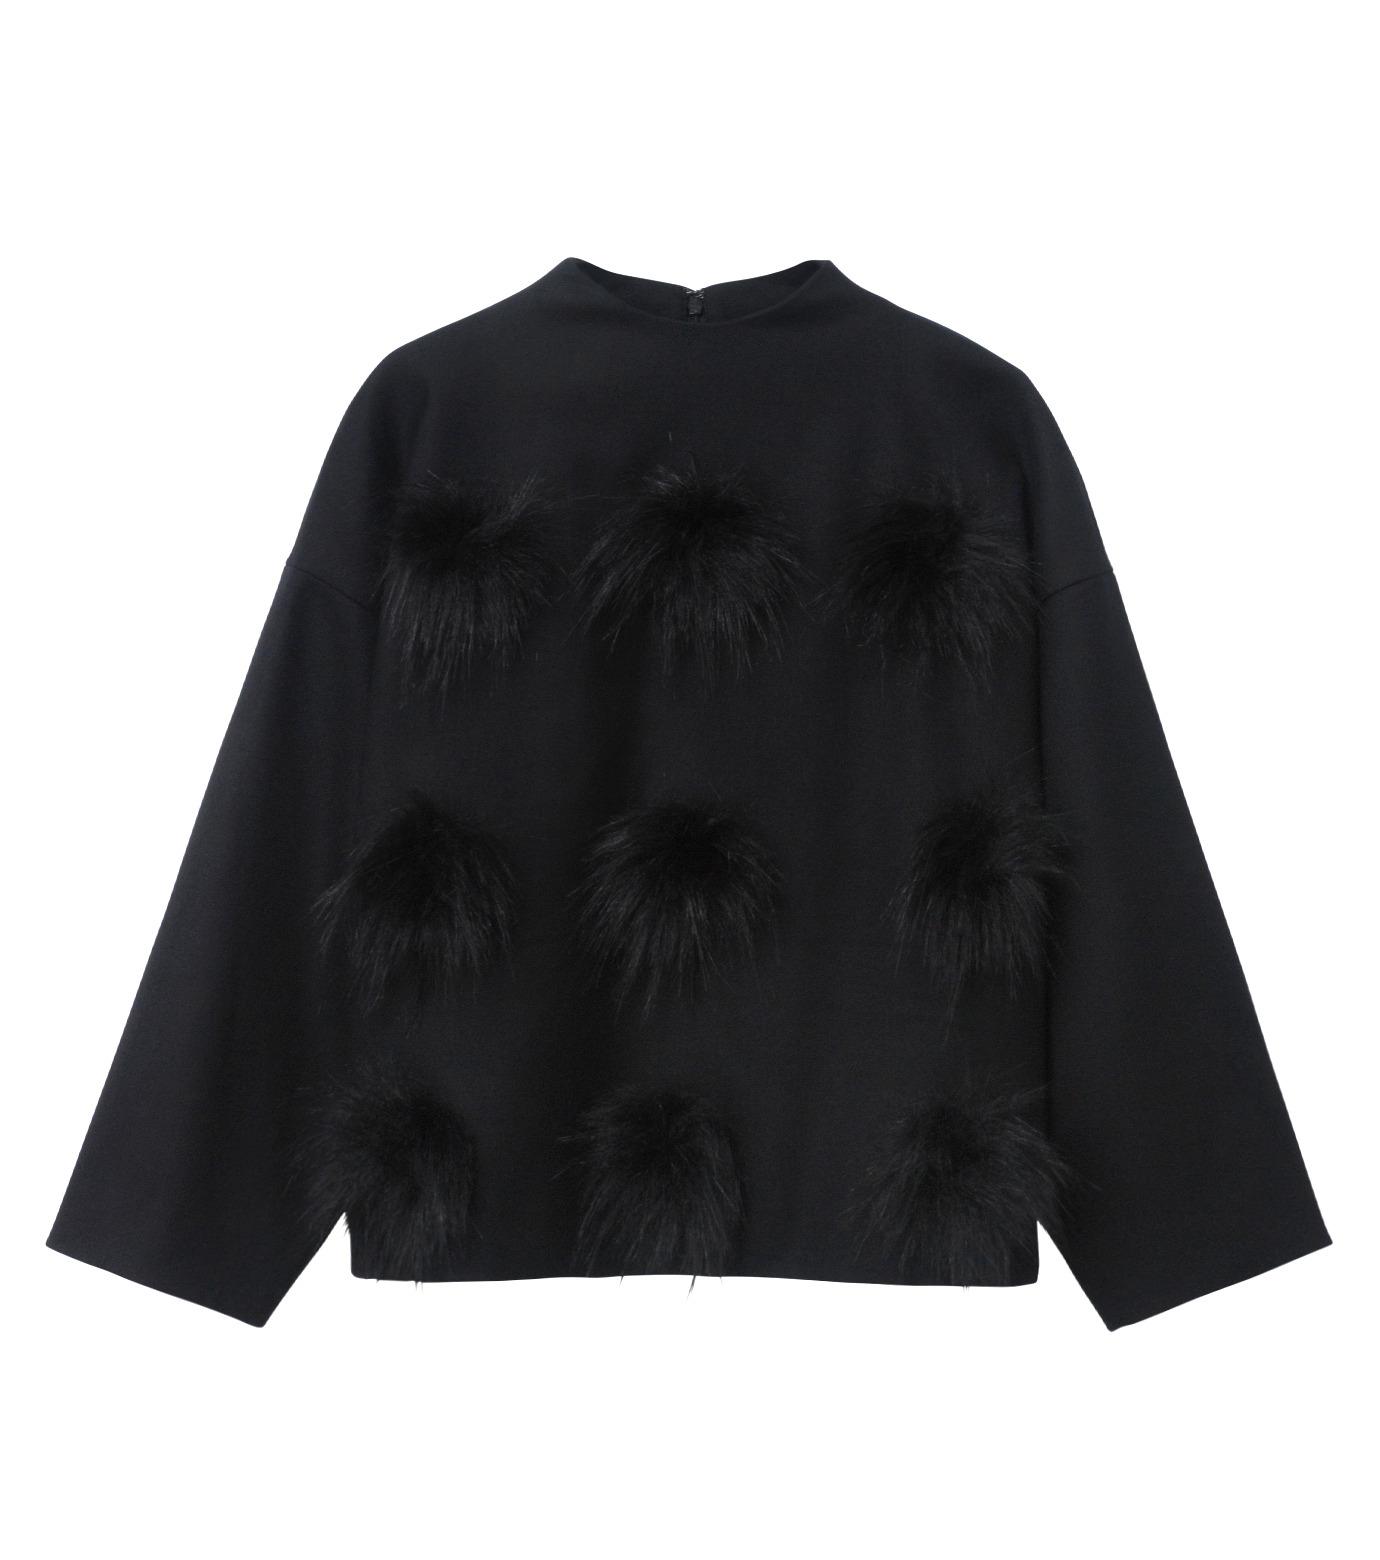 LE CIEL BLEU(ルシェルブルー)のフェイクファーポンポントップス-BLACK(シャツ/shirt)-17A63029 拡大詳細画像5